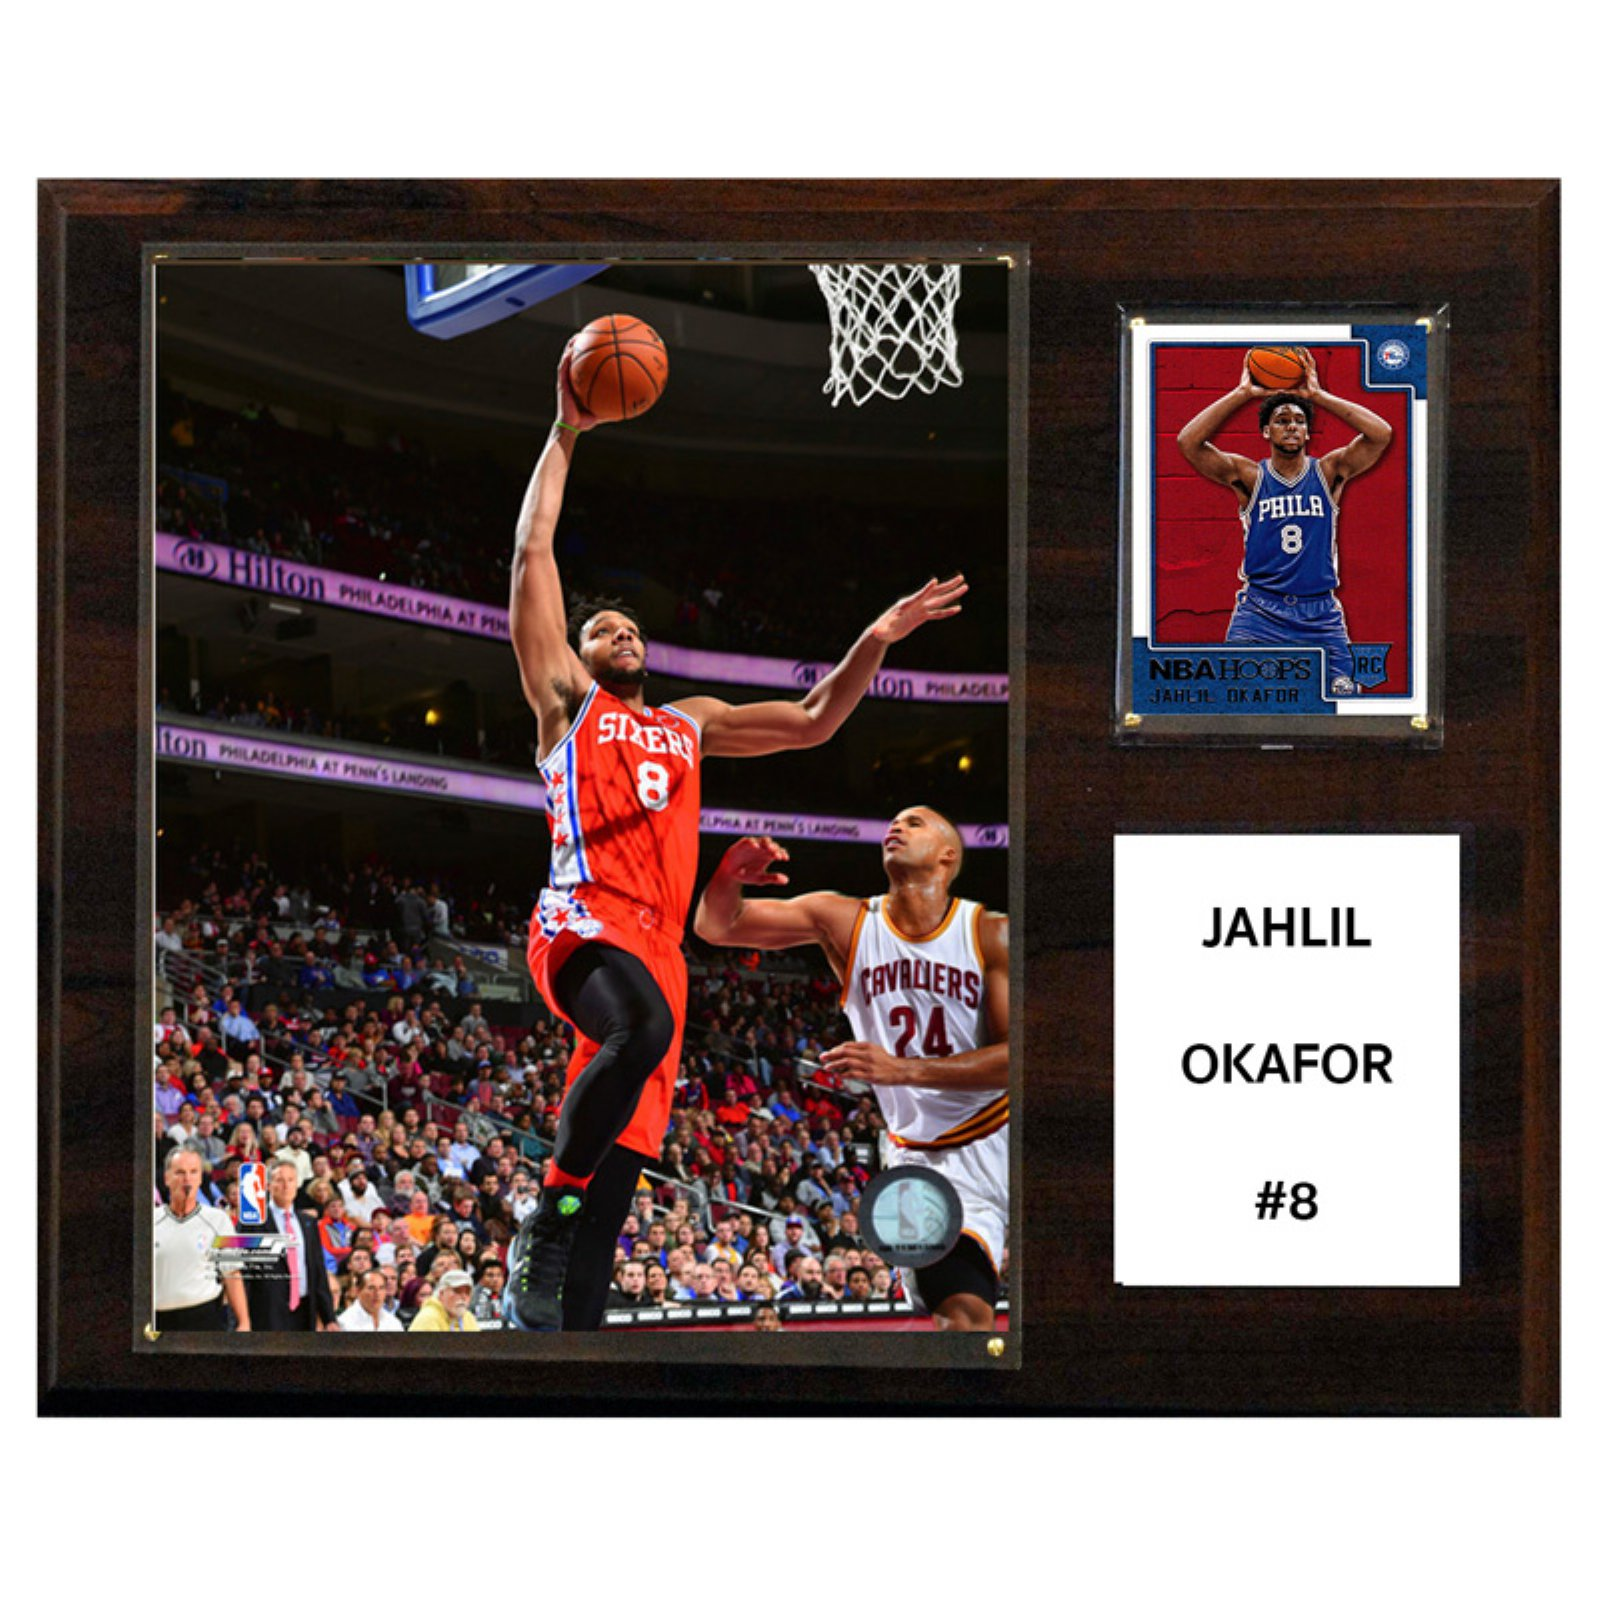 C&I Collectables NBA 12x15 Jahlil Okafor Philadelphia 76ers Player Plaque